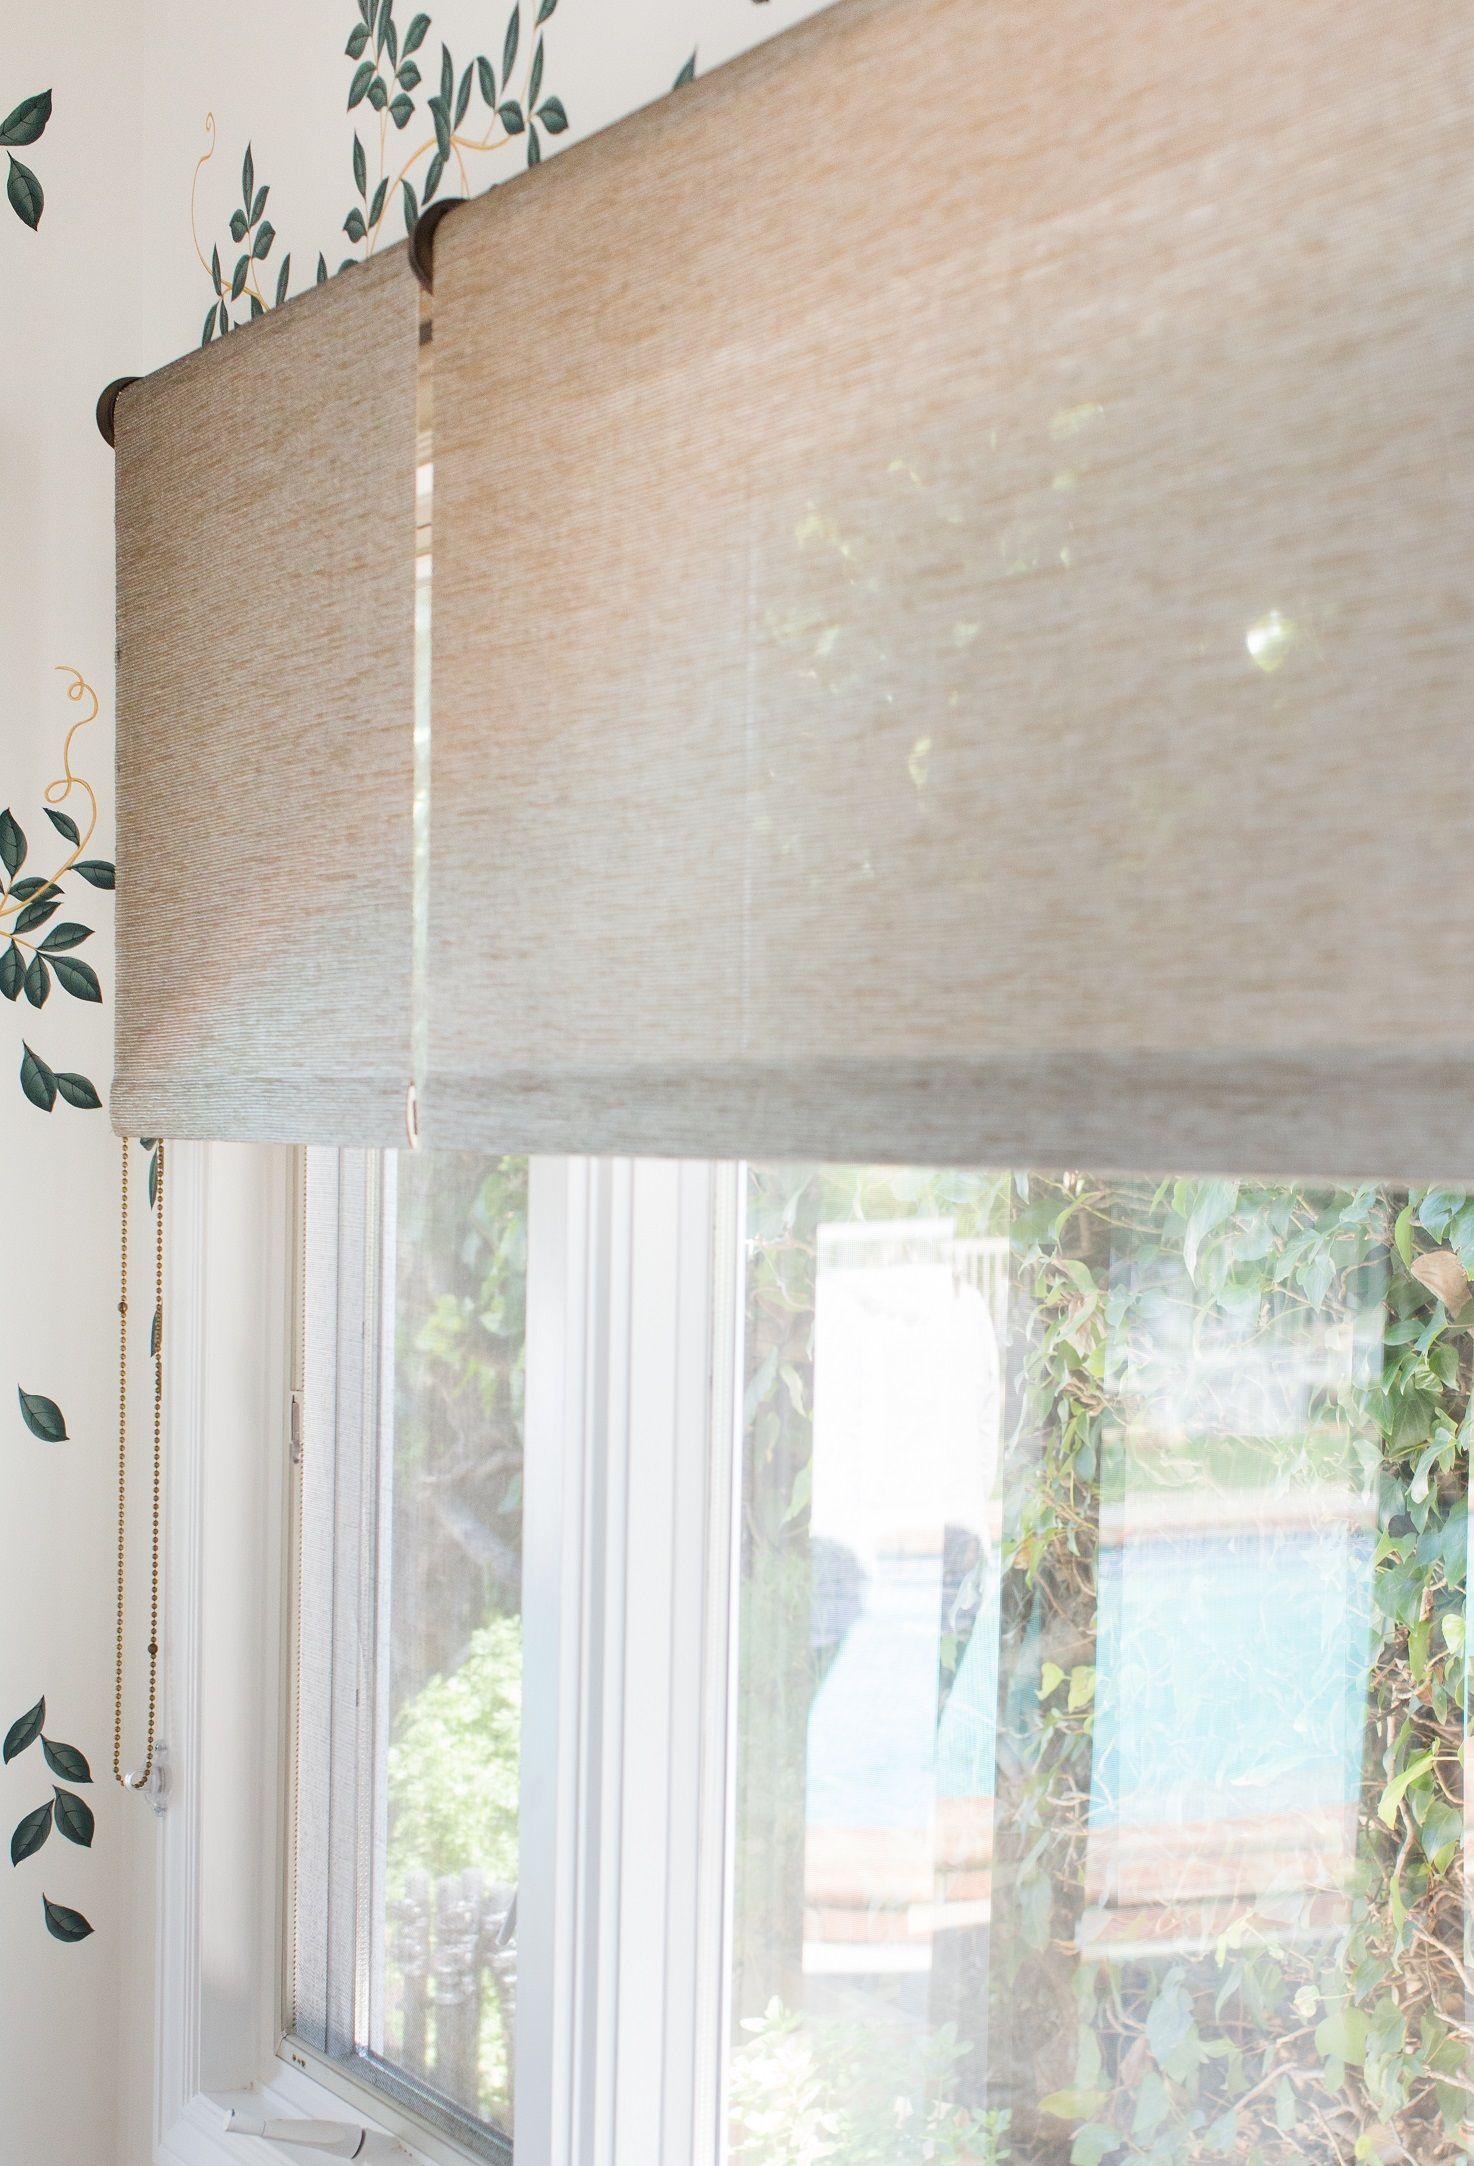 Natural Woven Shades Marie Flanigan Interiors Roller Shades Living Room Woven Shades Custom Window Shade